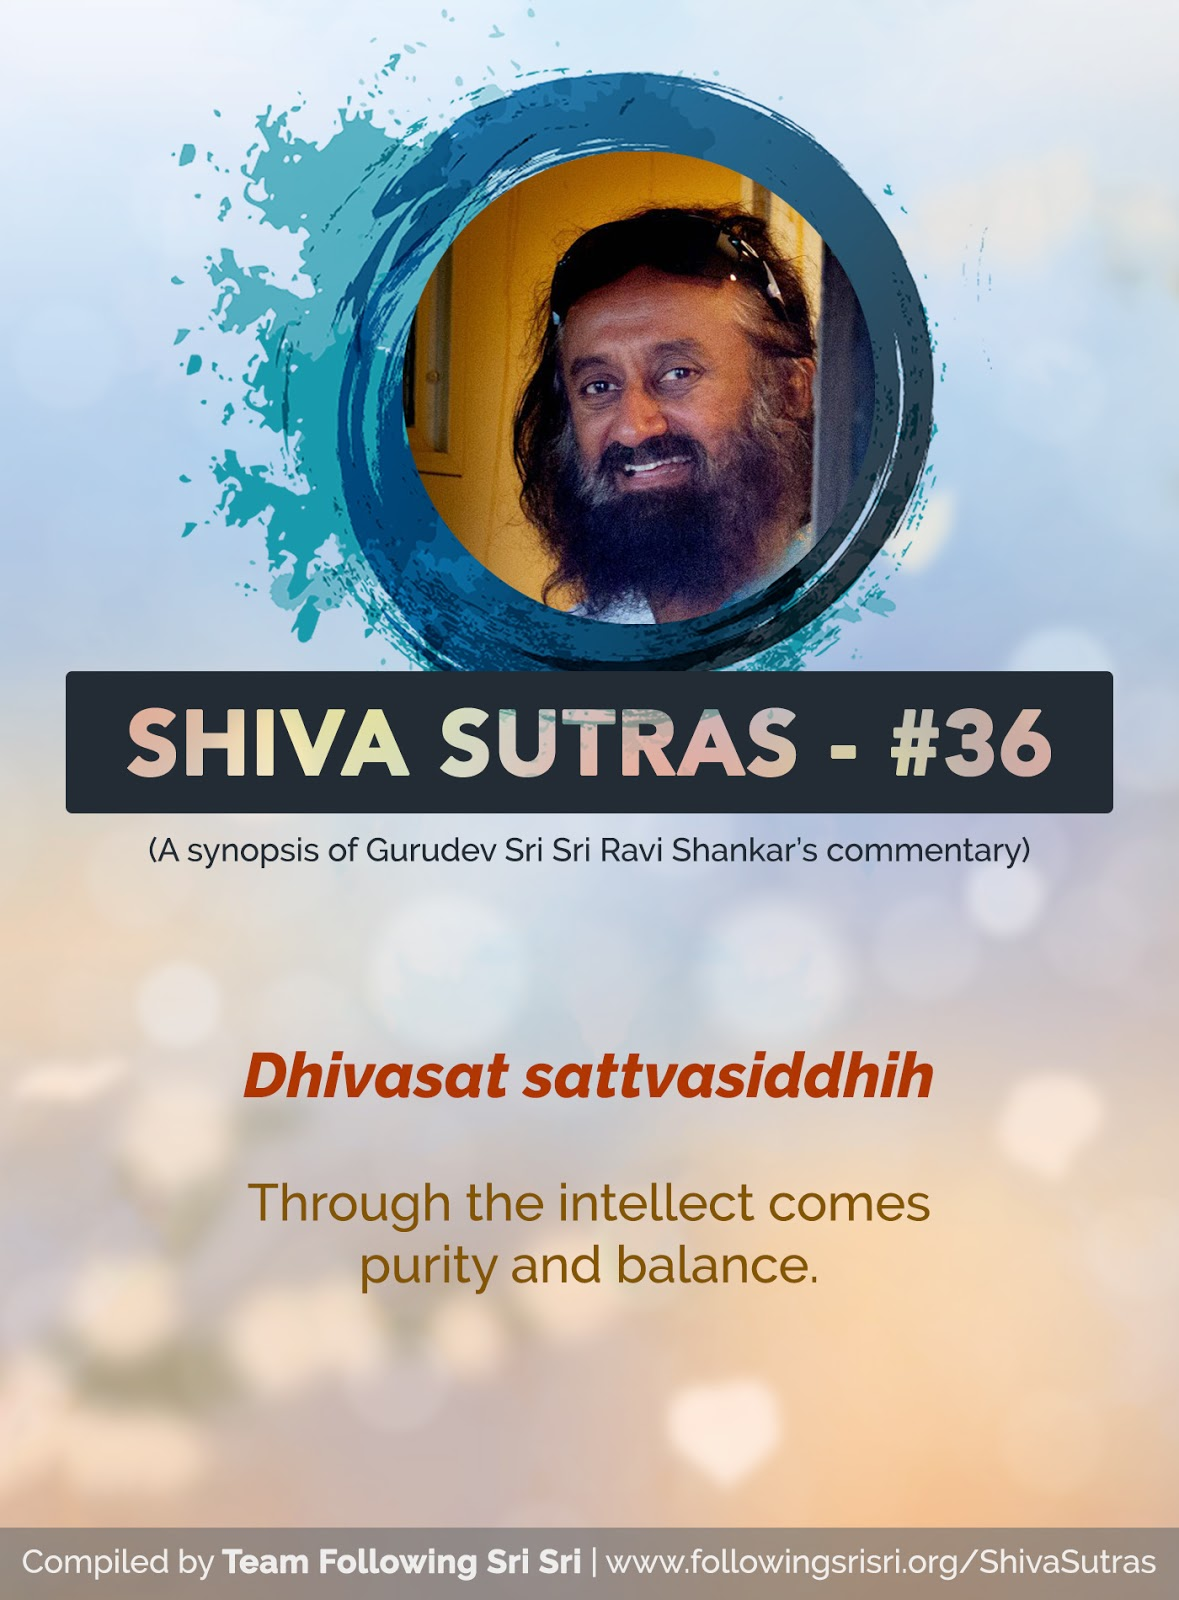 Shiva Sutras - Sutra 36